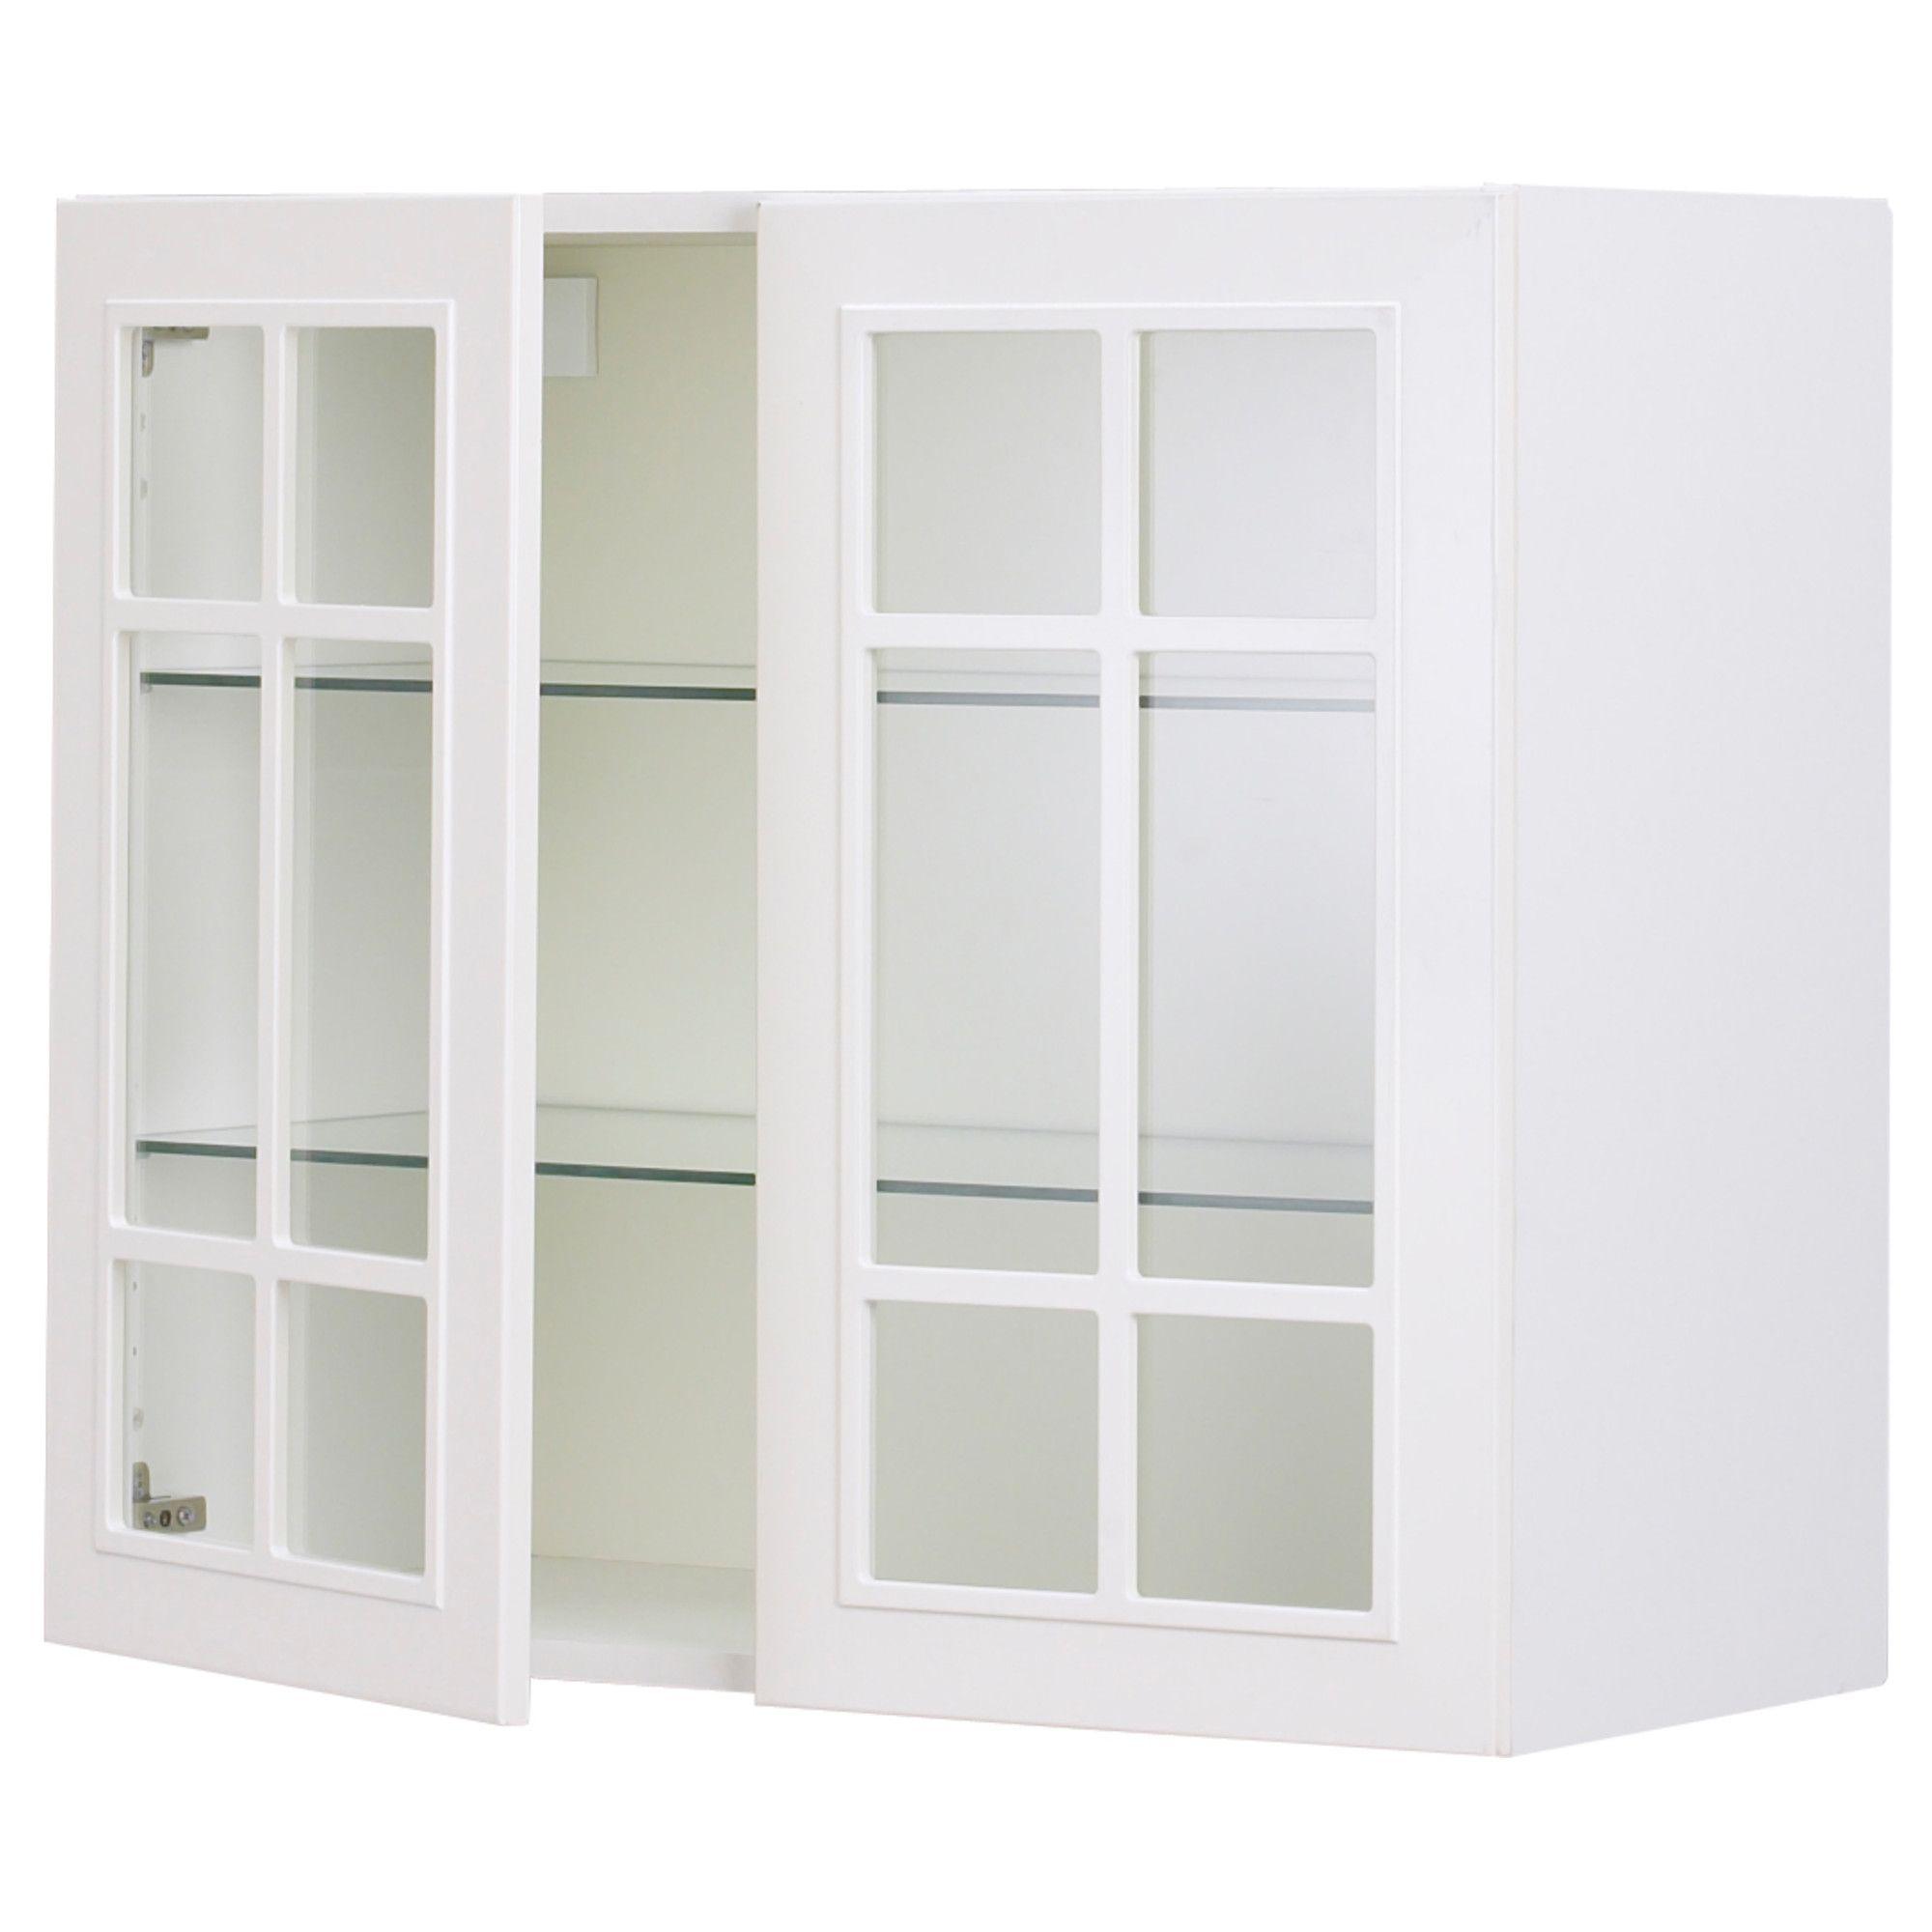 Akurum Wall Top Cabinet Frames Savae Org